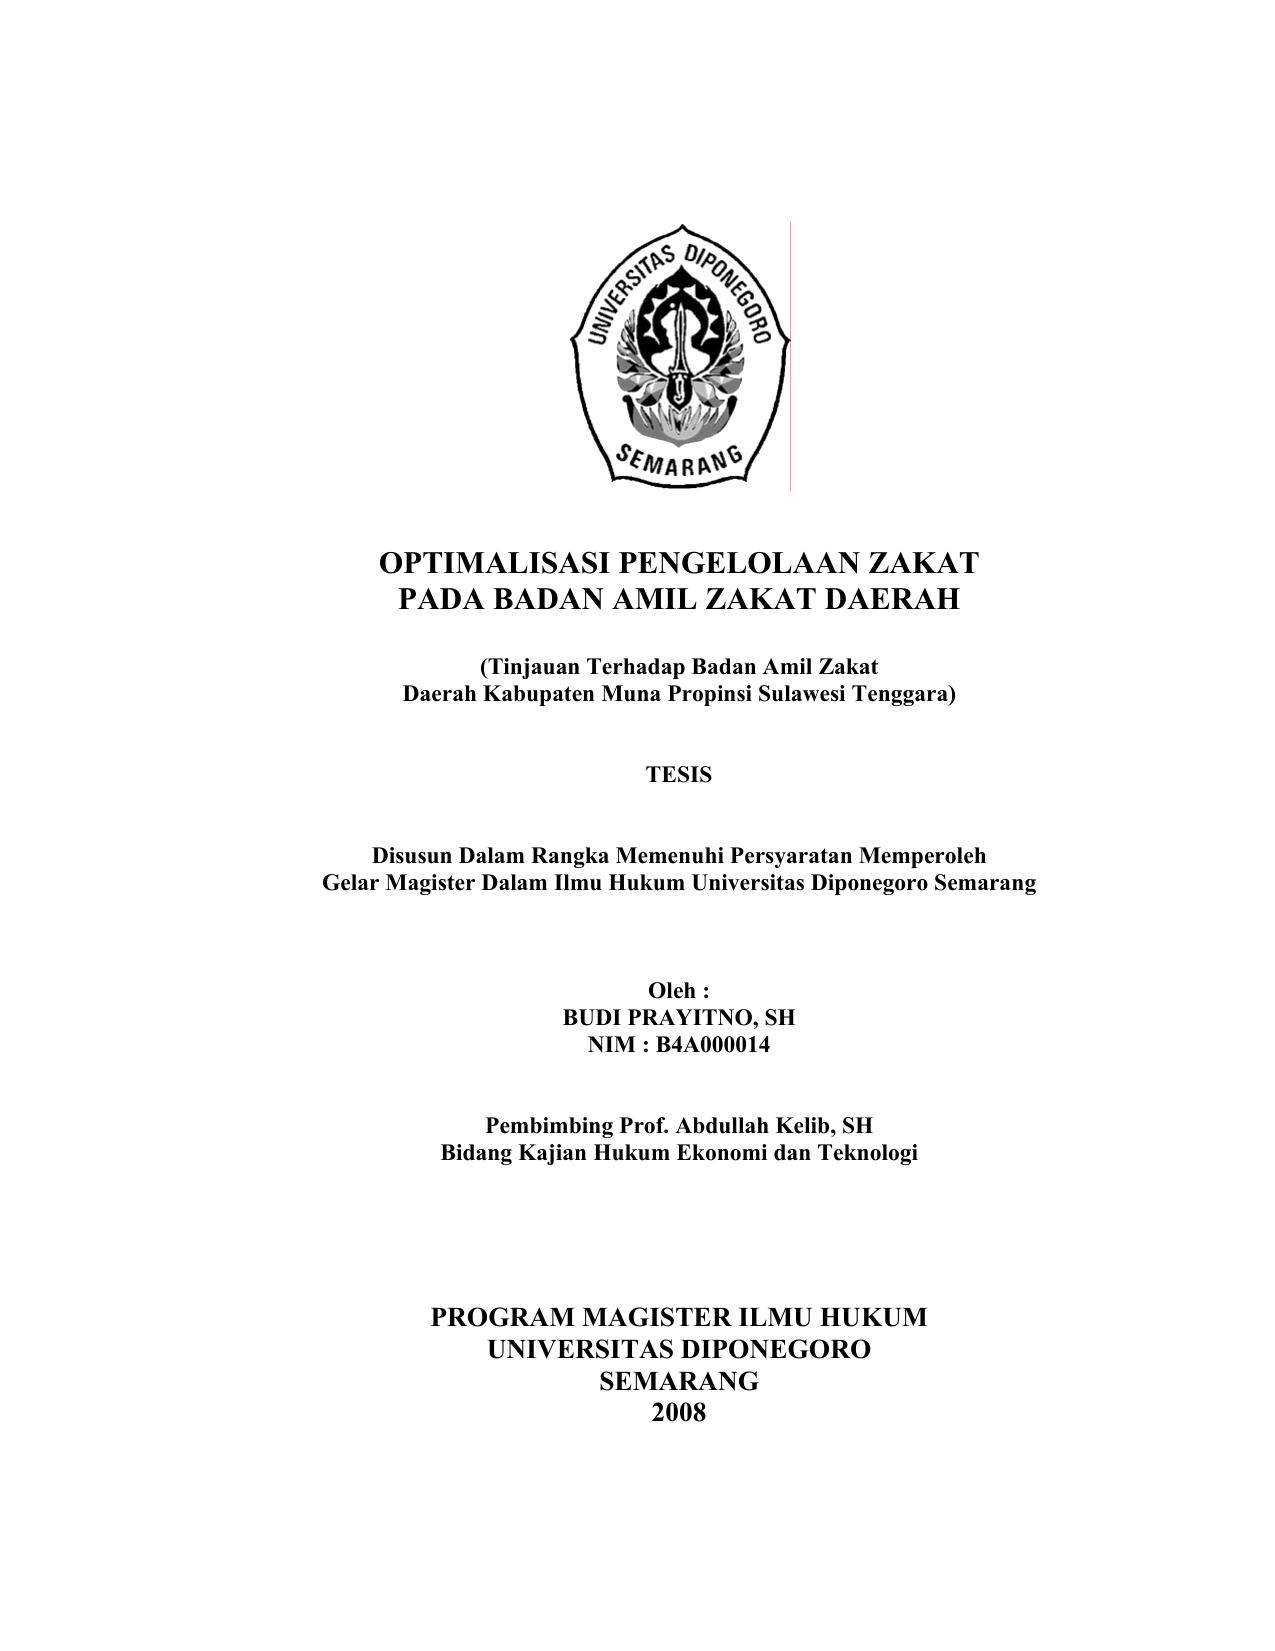 Optimalisasi Penge Aan Zakat Pada Badan Amil